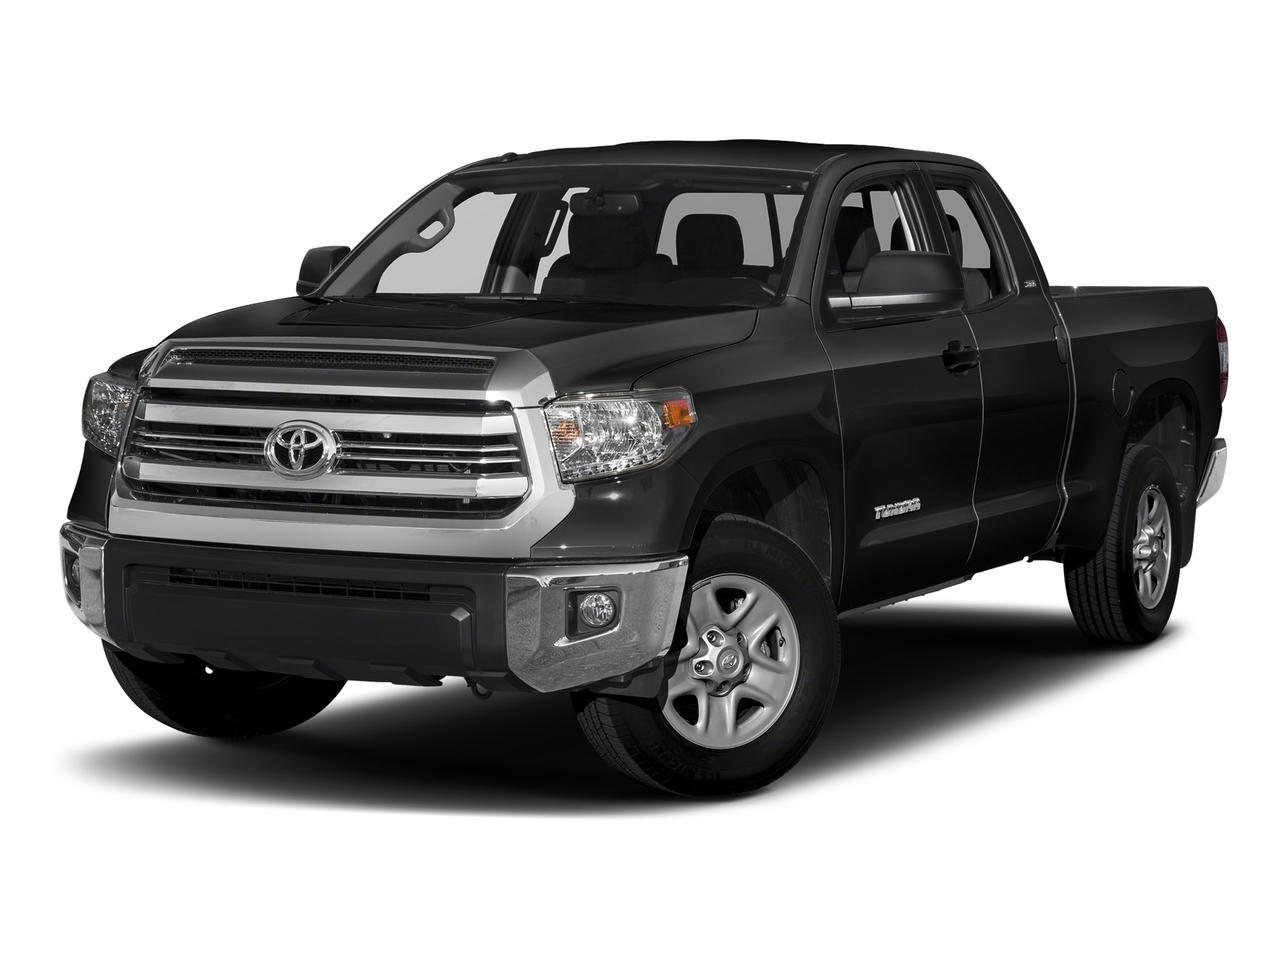 2017 Toyota Tundra 2WD Vehicle Photo in San Antonio, TX 78230